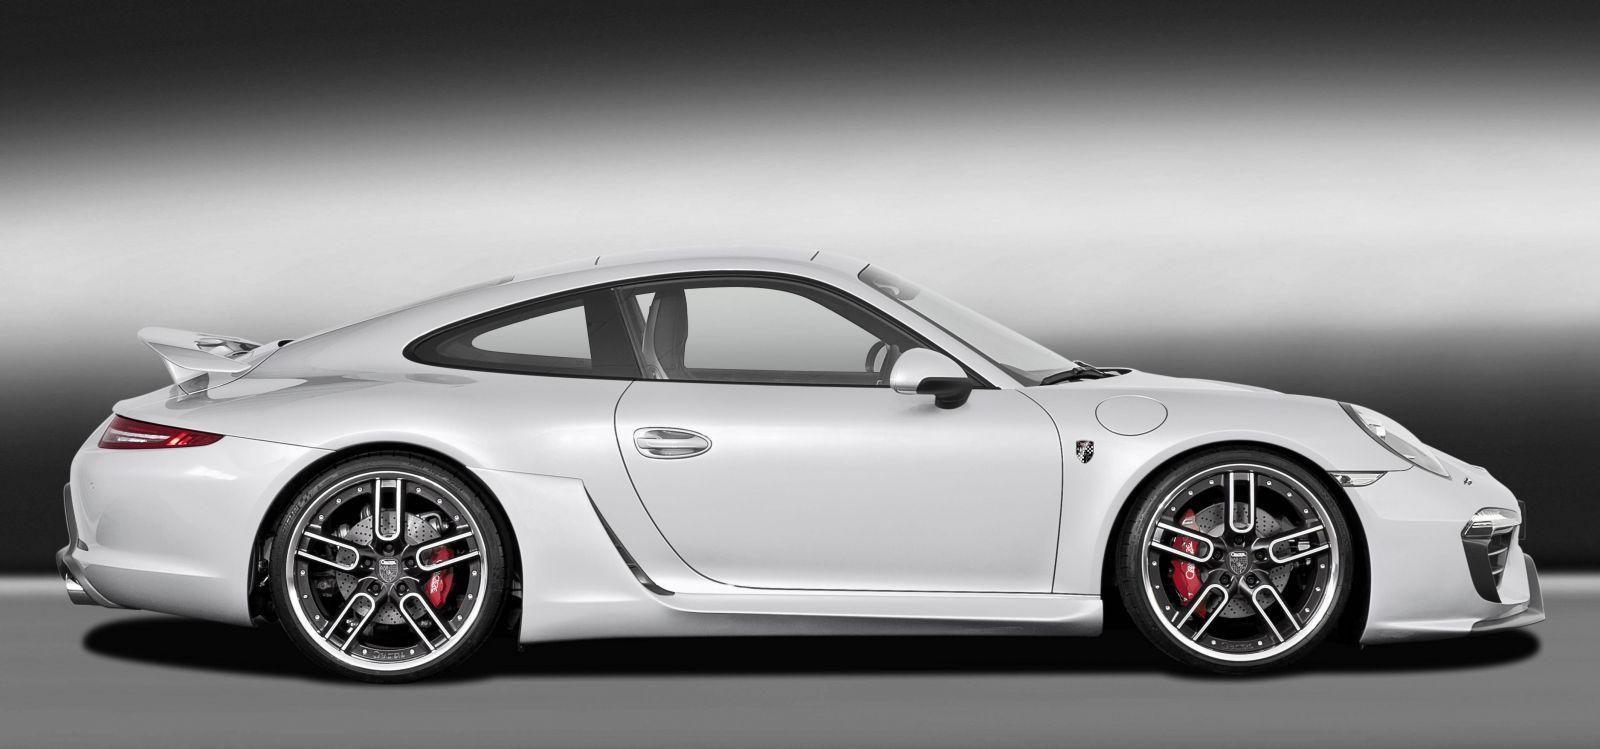 caractere exclusive present porsche 911 kit at 2012 sema photo - 911 Porsche 2015 White